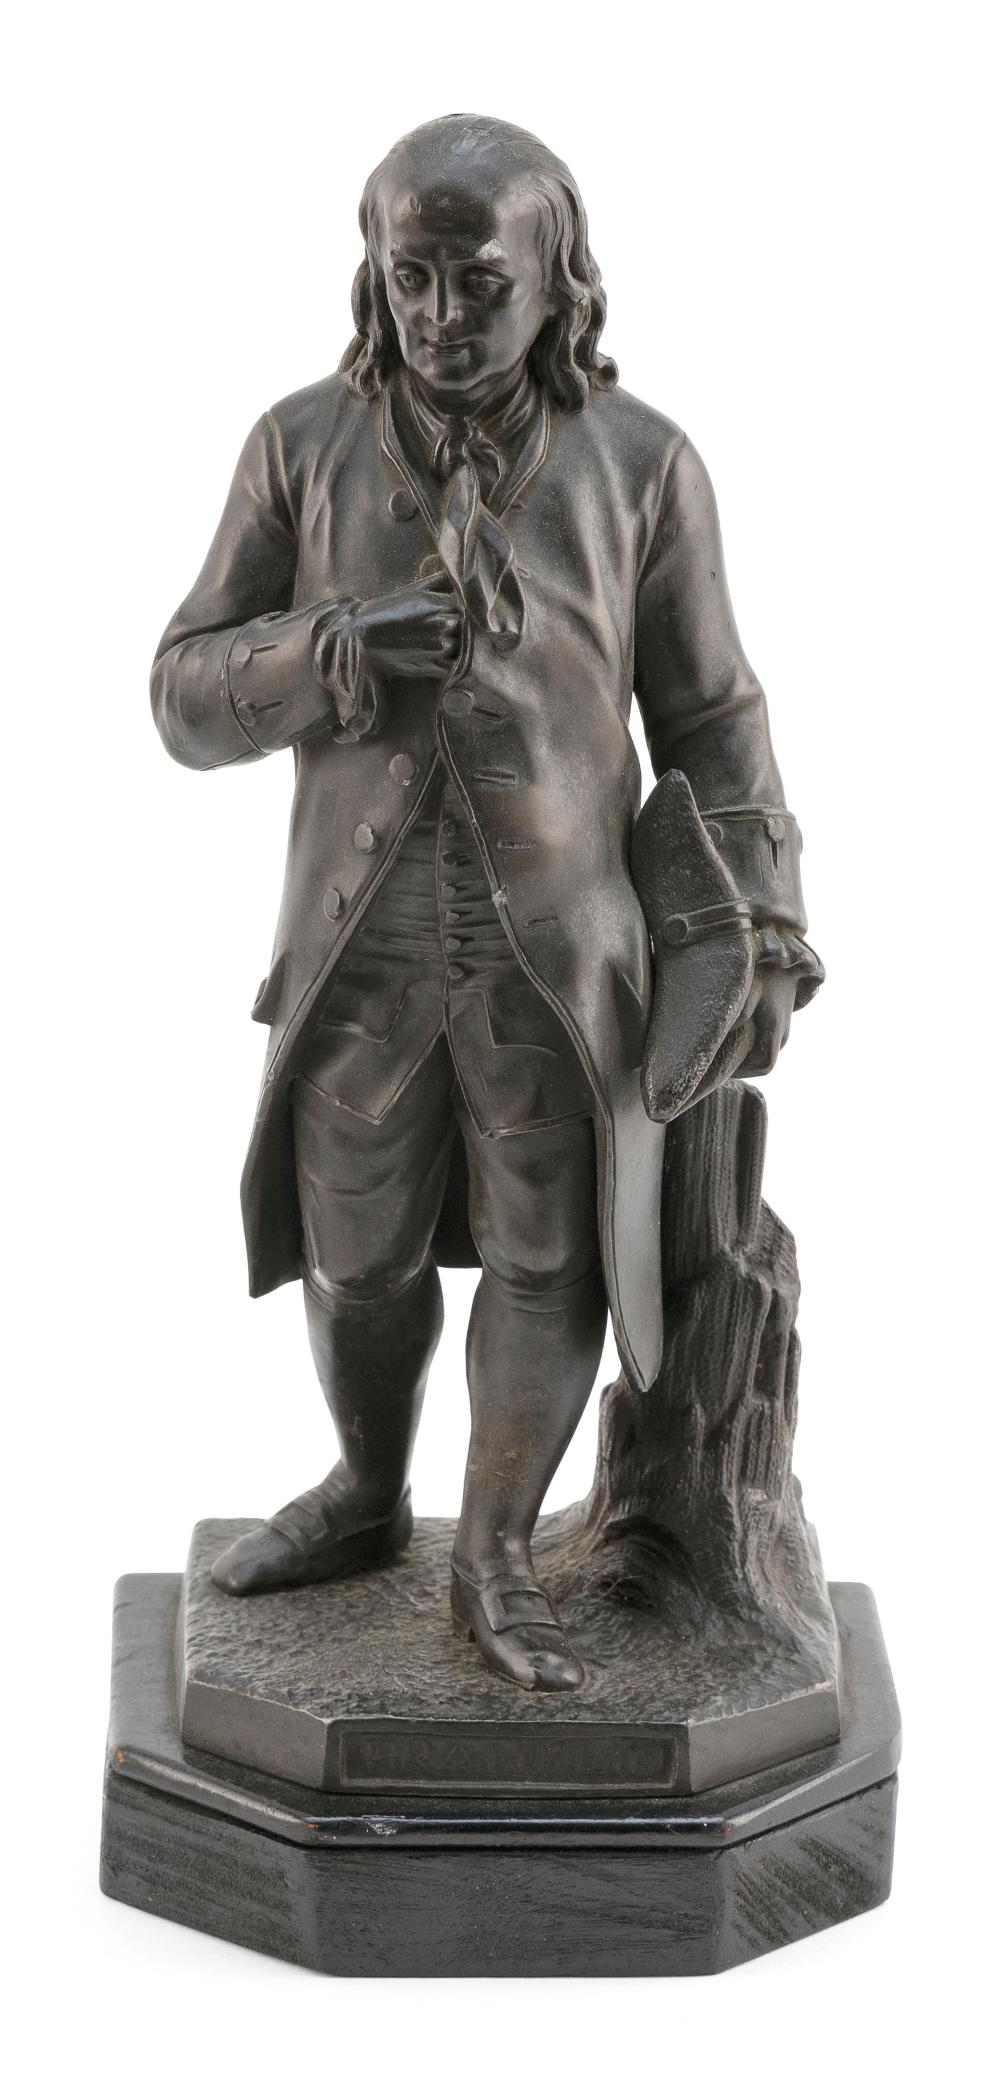 "METAL SCULPTURE OF A STANDING BENJAMIN FRANKLIN 19th Century Height 10.75""."